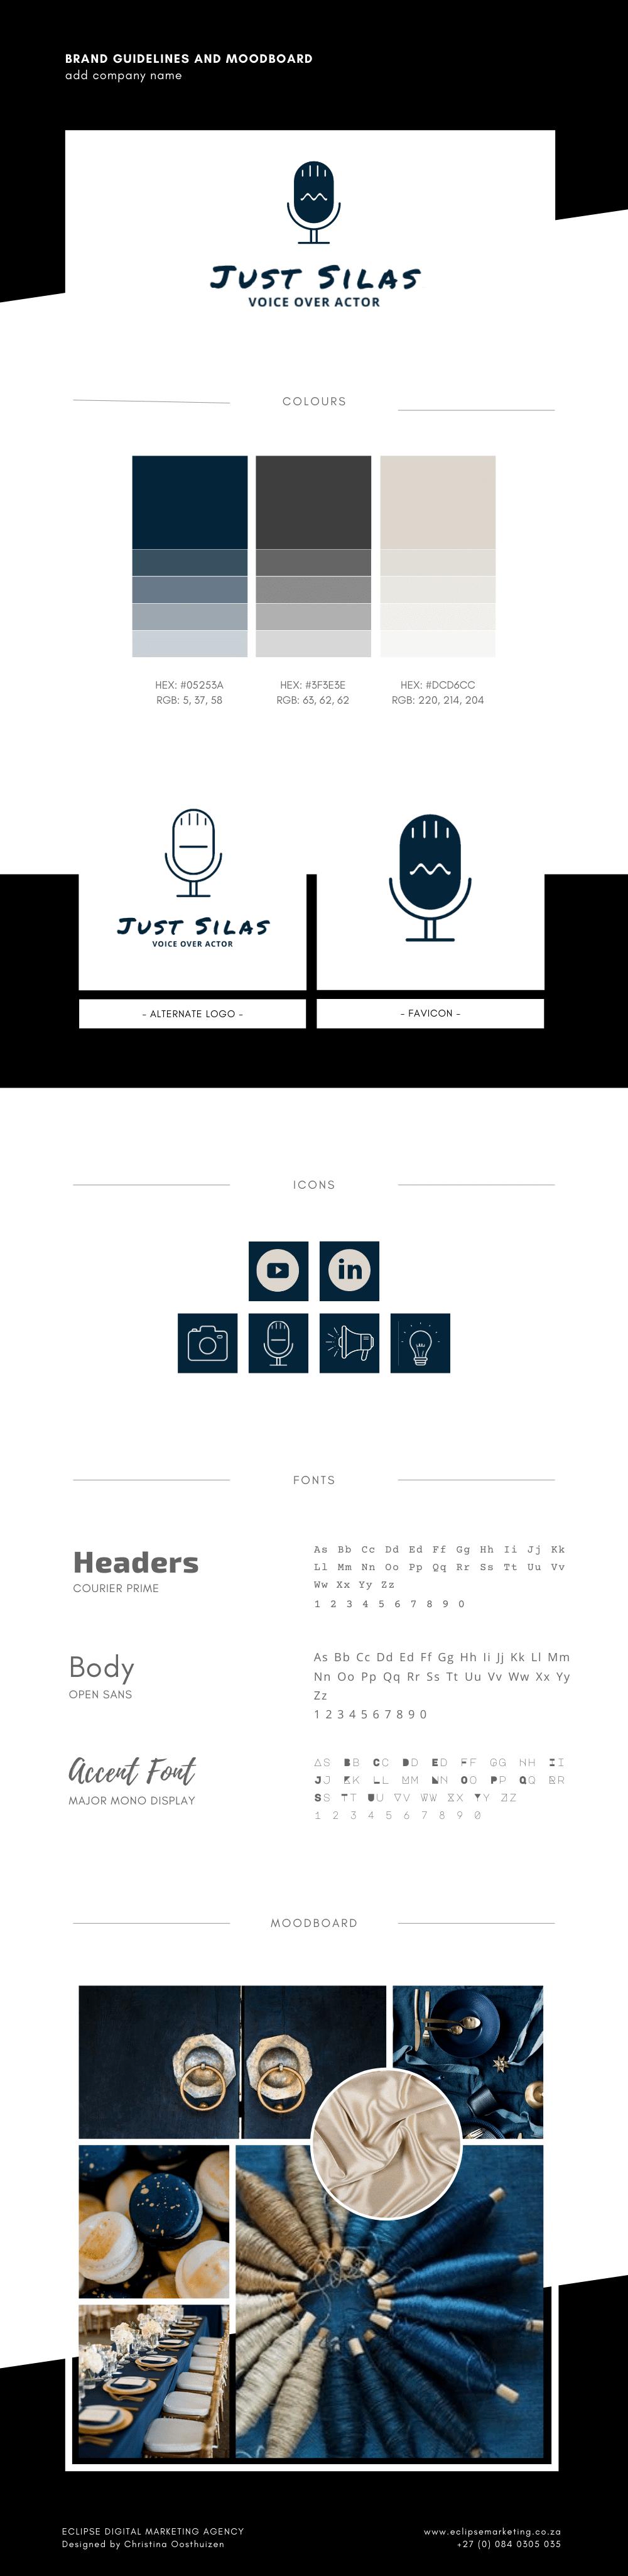 Eclipse Digital Marketing Agency - Just Silas Brand Board